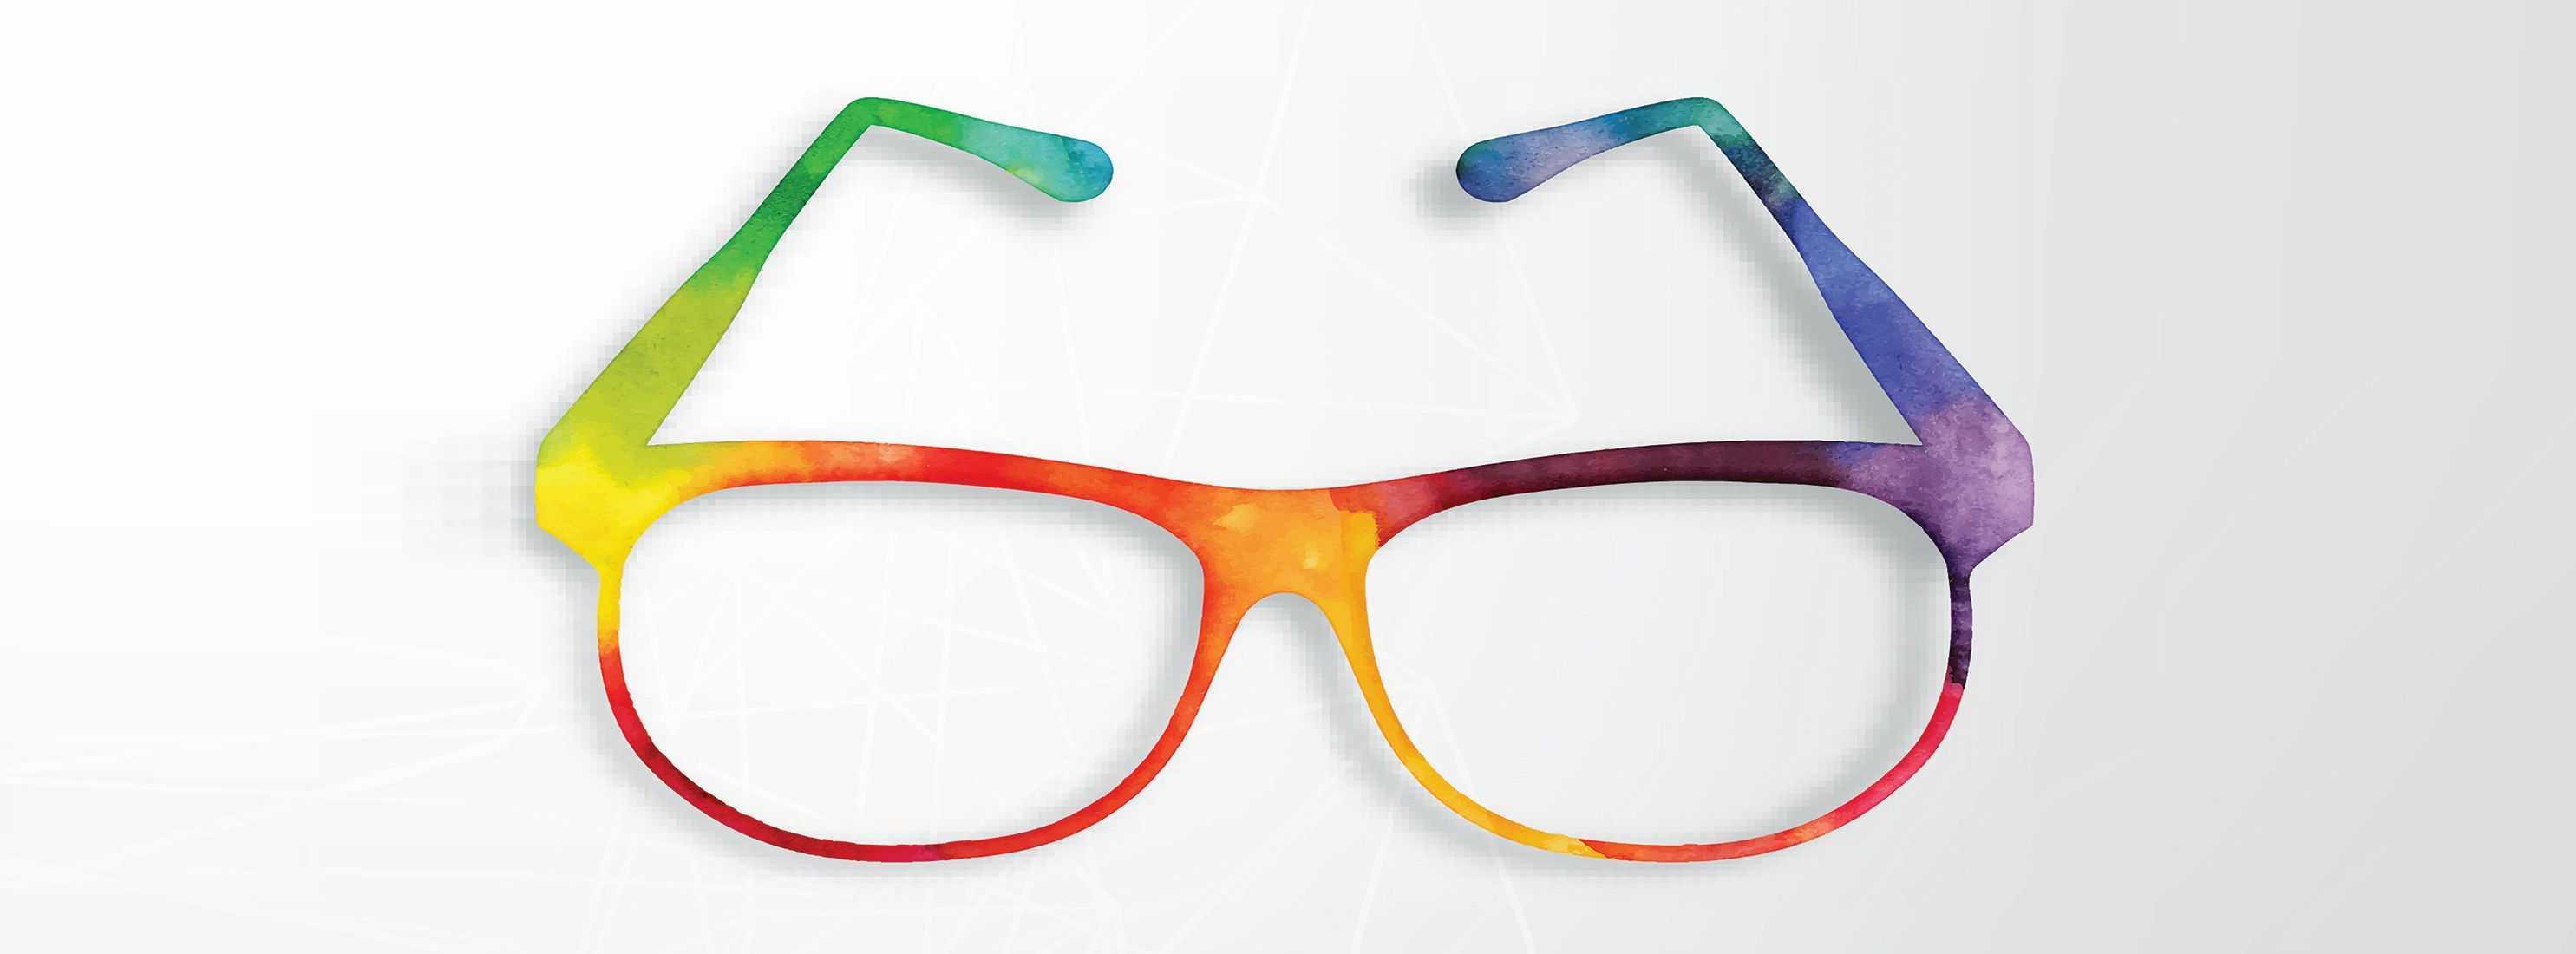 Spectacles Repaint